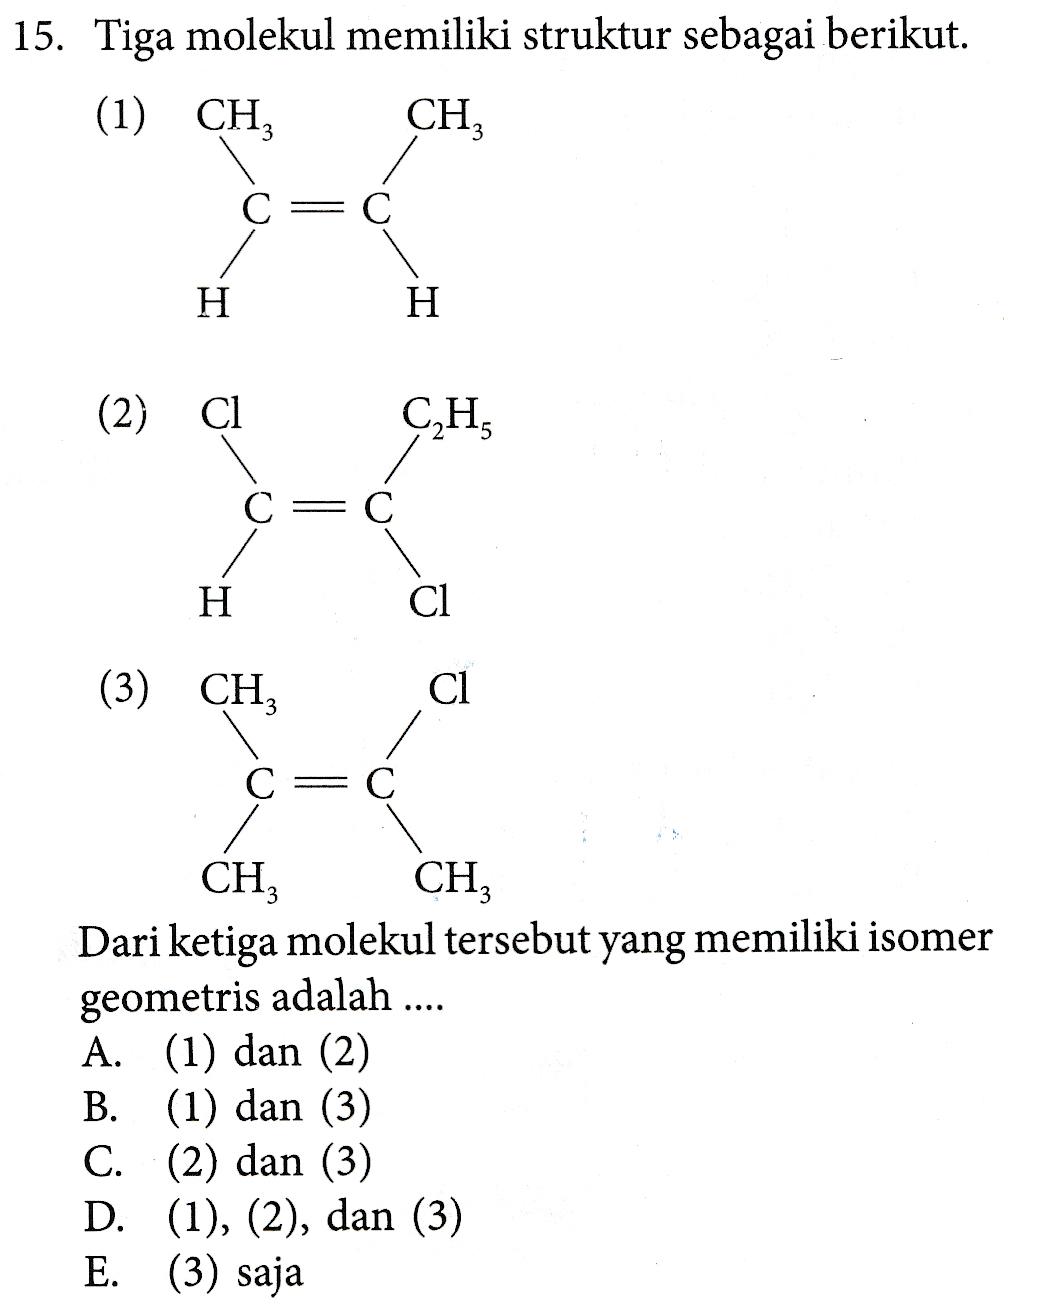 15. Tiga molekul memiliki struktur sebagai berikut. (1) CHZ CH С = С H H (2) C1 C2H C=C H Cl (3) CHZ Cl C = C CH, CH Dari ketiga molekul tersebut yang memiliki isomer geometris adalah ... A. (1) dan (2) B. (1) dan (3) C. (2) dan (3) D. (1), (2), dan (3) E. (3) saja